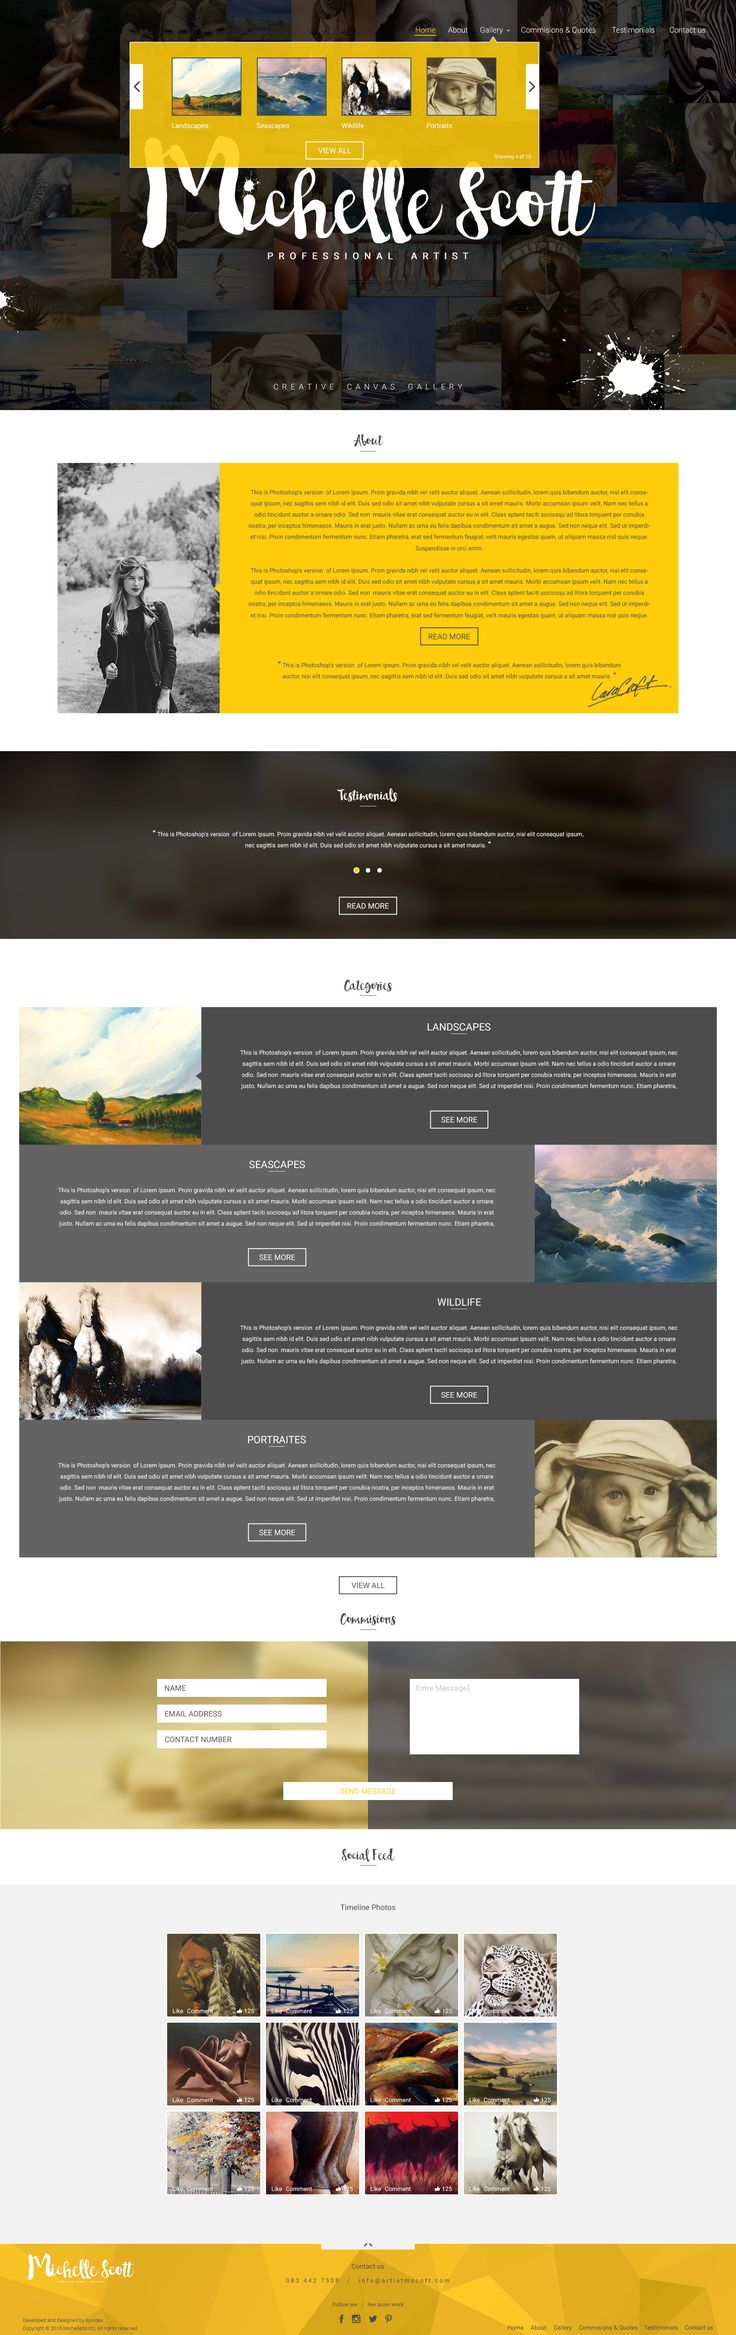 Mock up Home page concept design for artists website. Designed by Epicdev. http://epicdev.co.za/